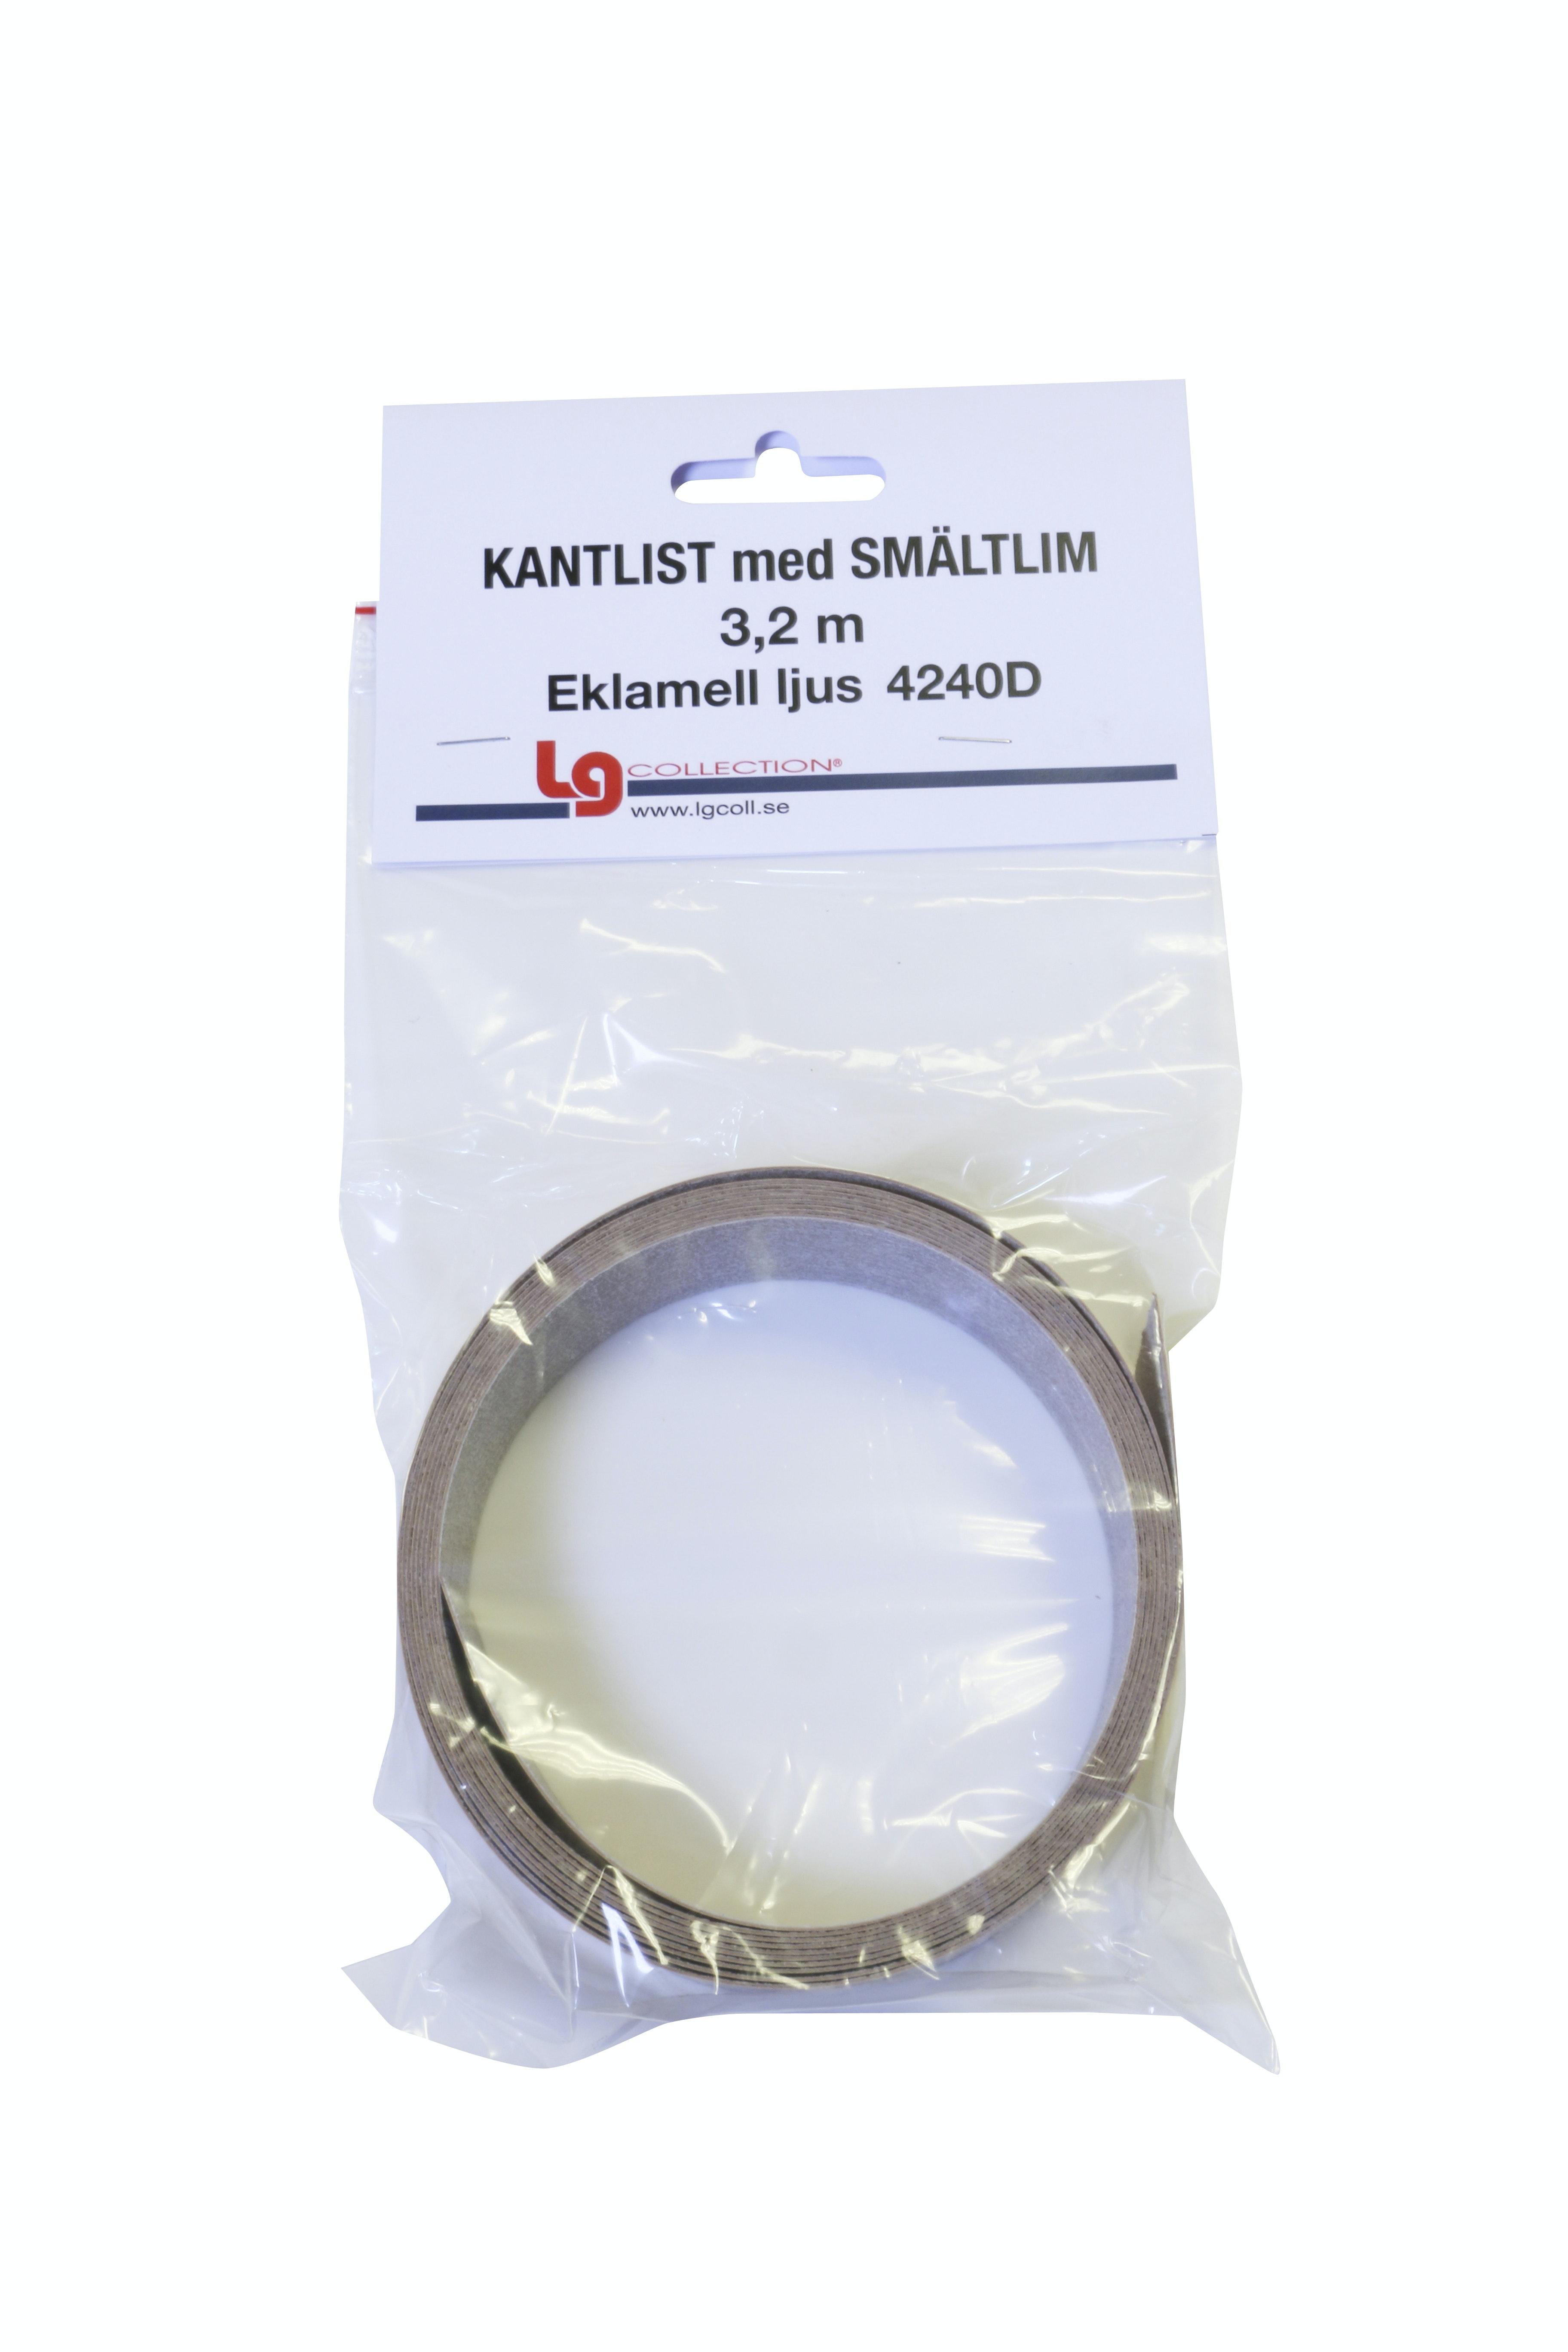 Kantlist LG Collection Sm3,2m Sm-List Eklamell Ljus Tr